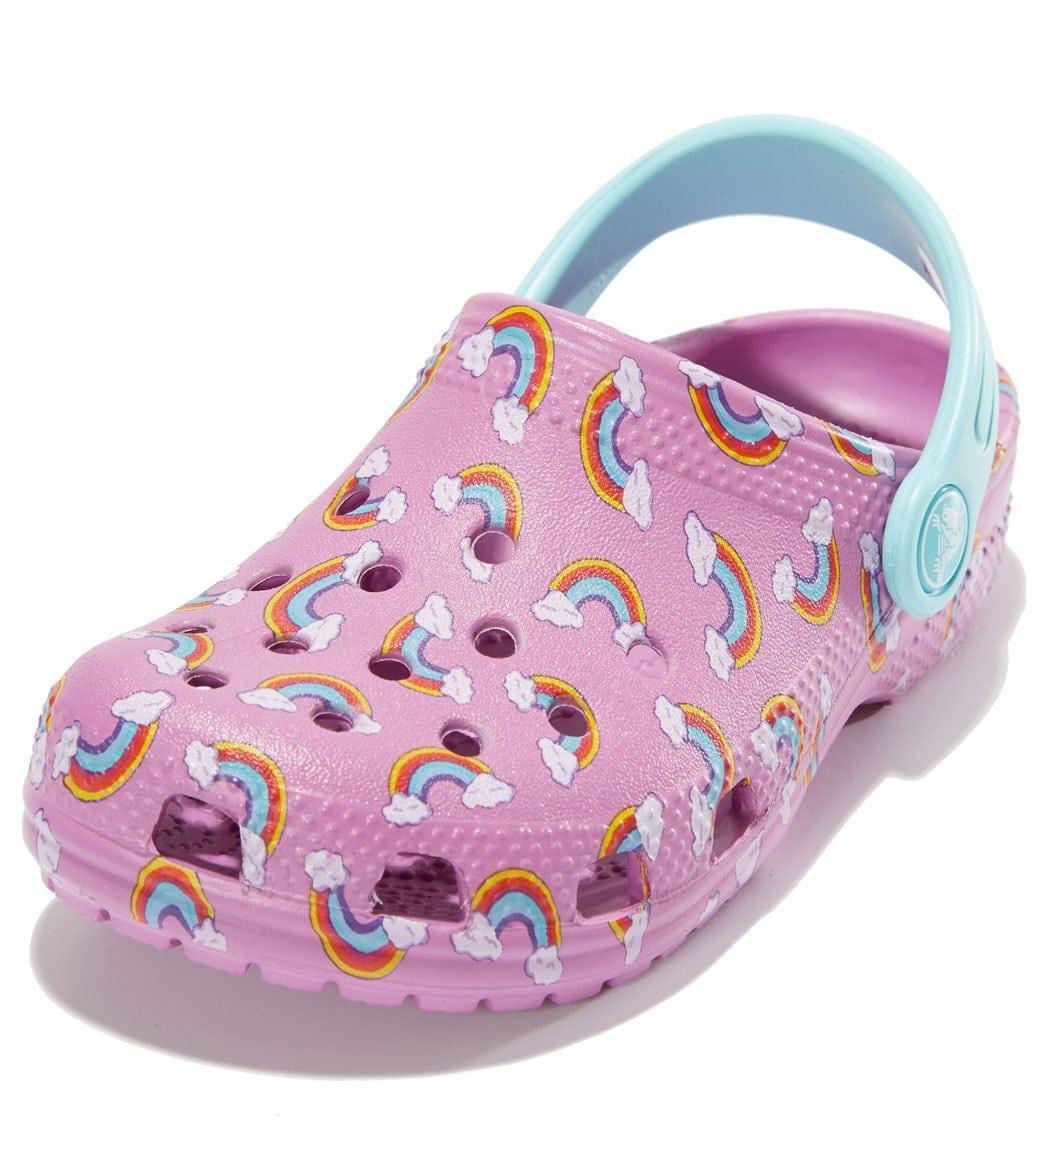 518226b3e0d7 Crocs Classic Graphic Clog (Toddler